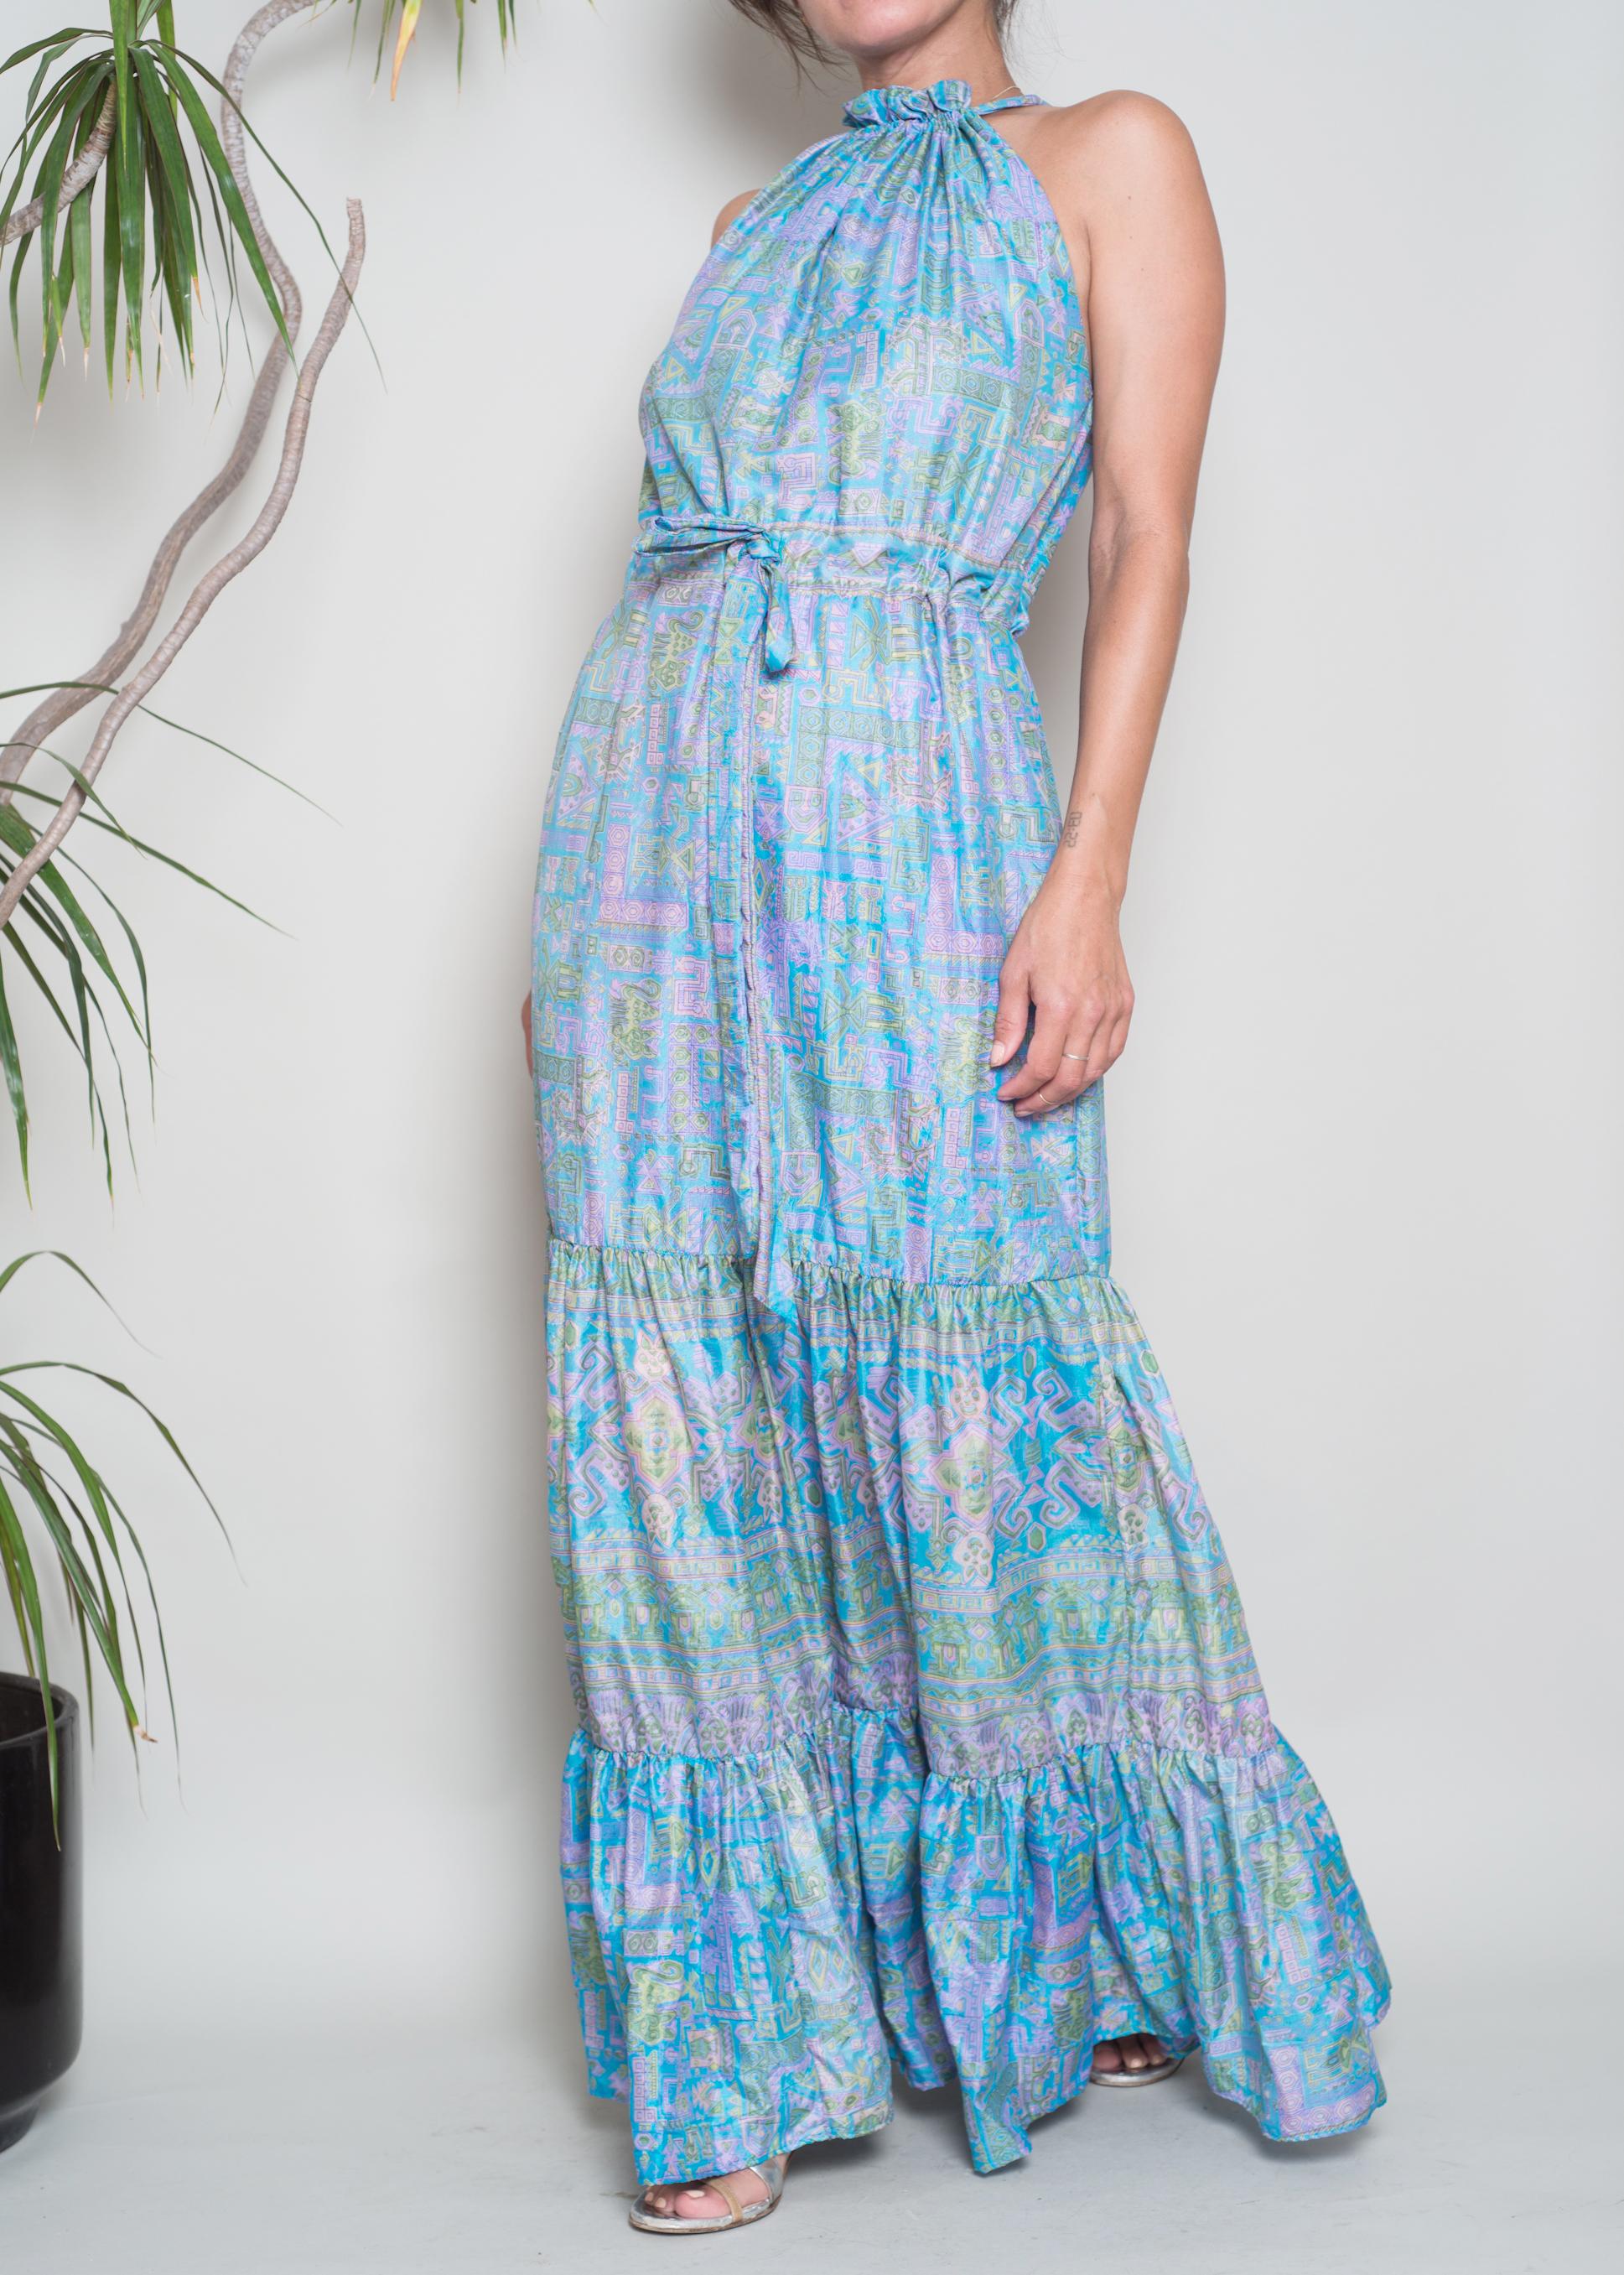 Le_Marie_Collection_Miranda_Tiered_Halter_Dress_004.jpg